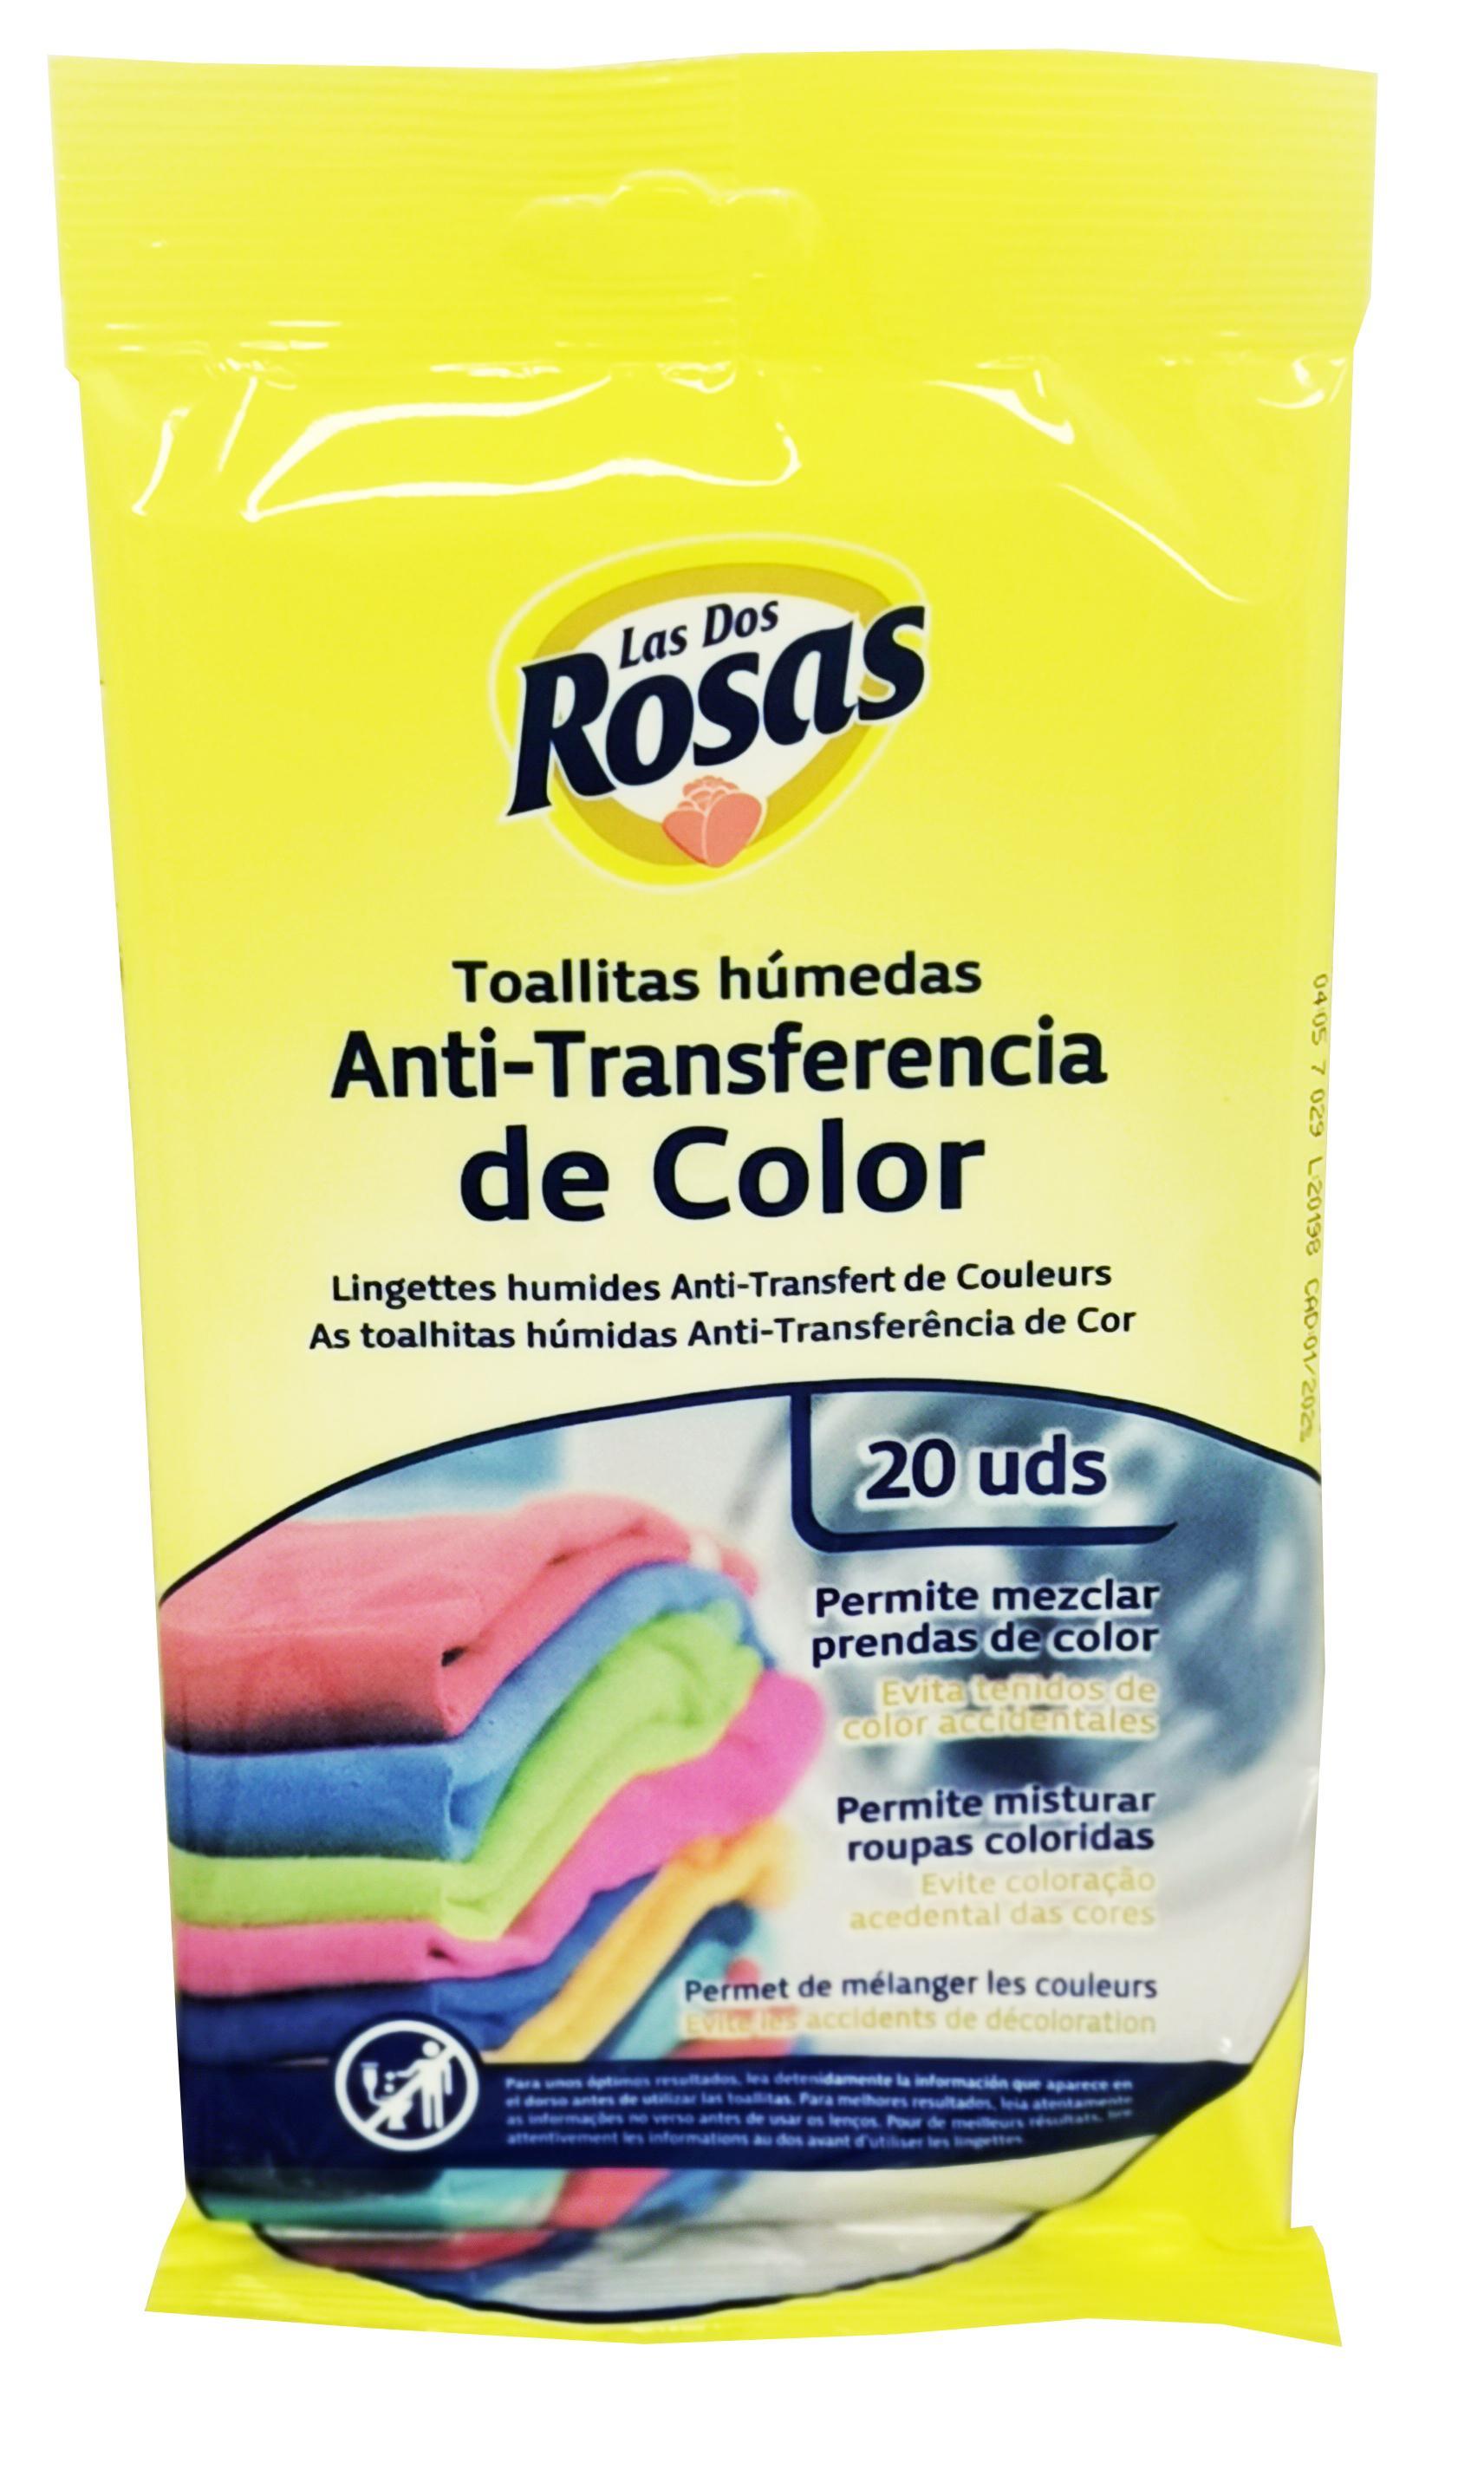 Las 2 Rosas Toallitas Color Húmedas